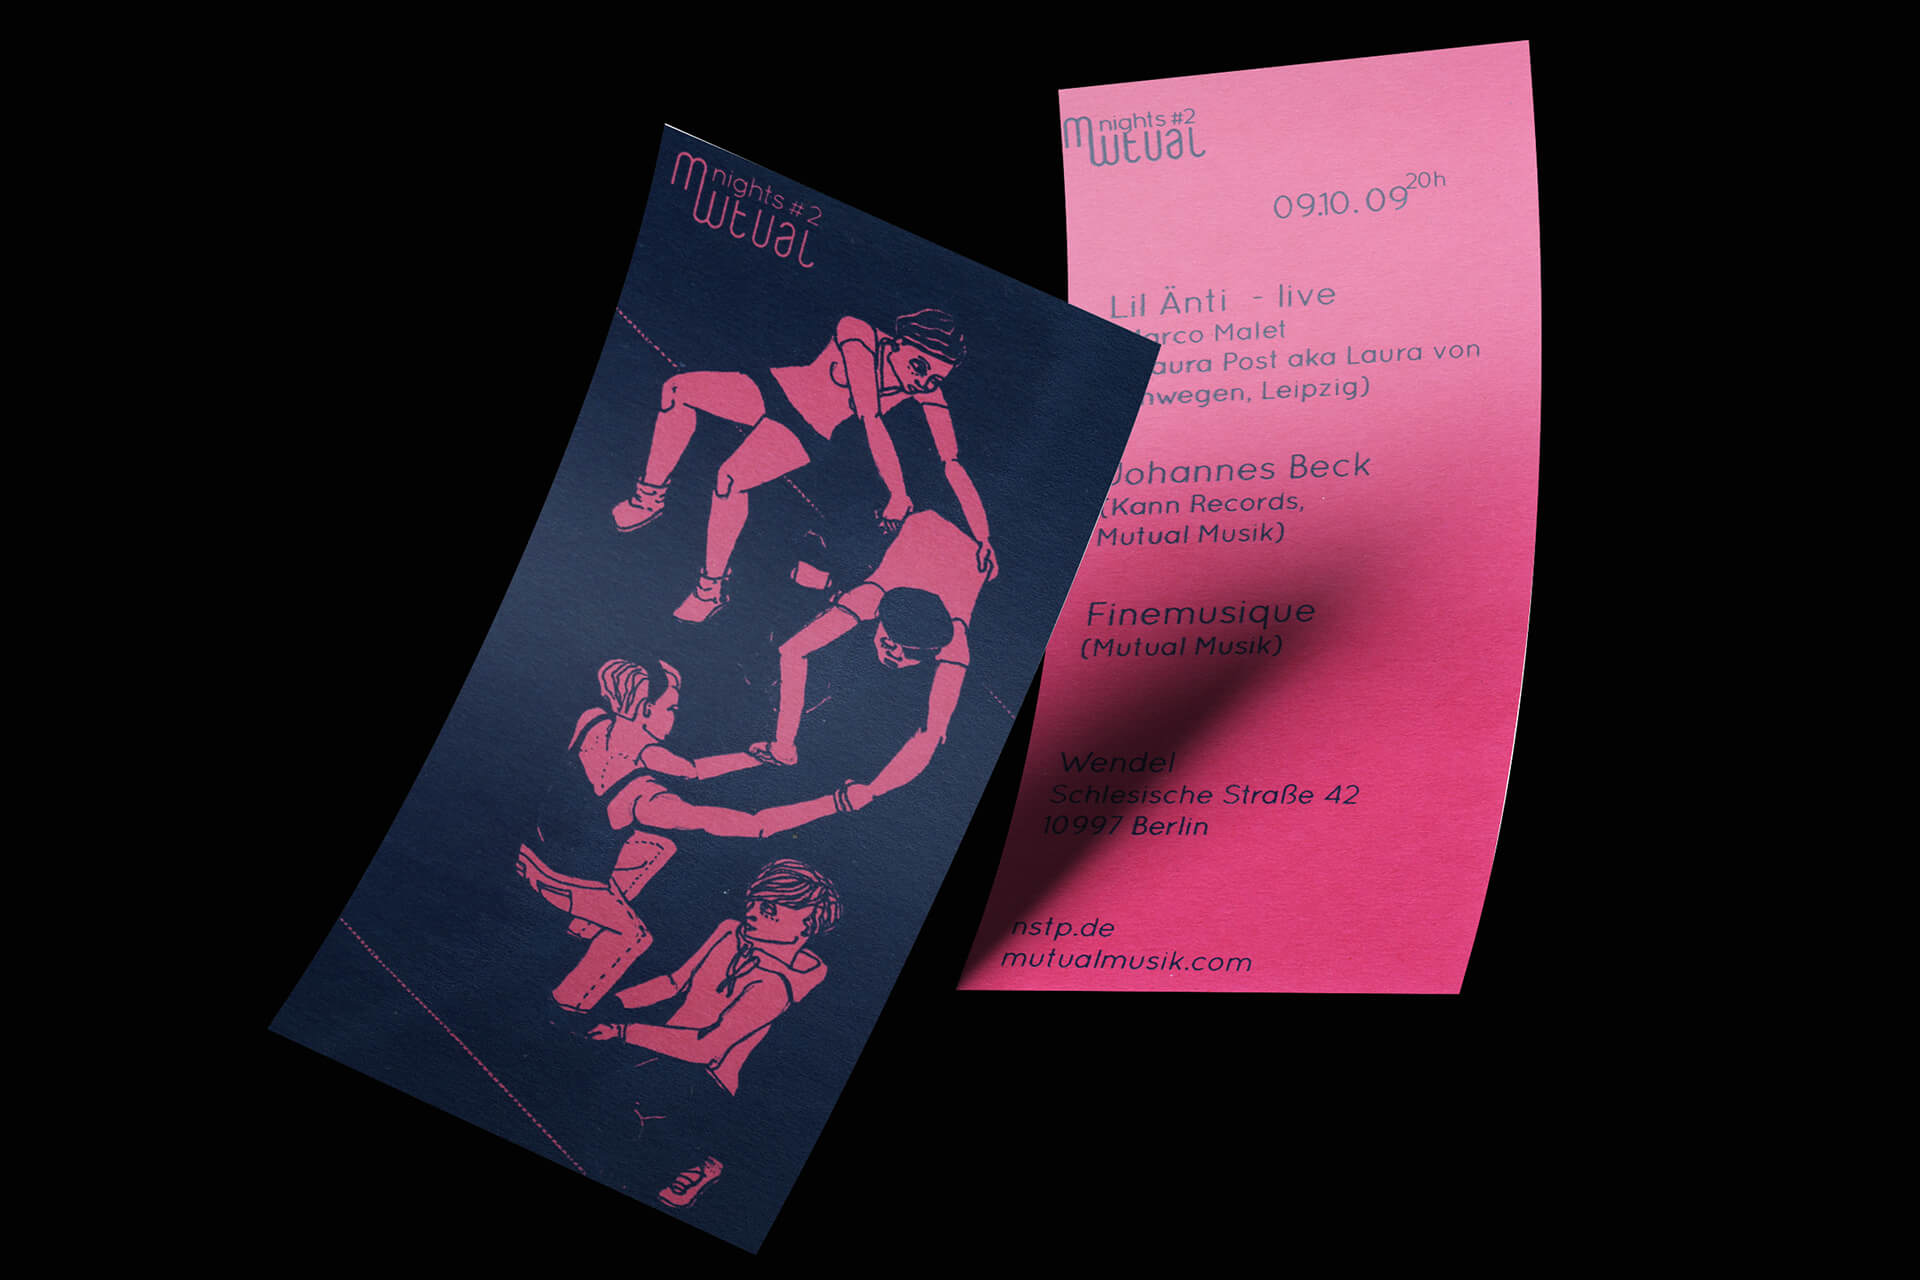 Denken & Handeln, Mutual Musik, Fine Heininger, Plattenlabel, Flyer Gestaltung, Illustration, Berlin, Musik Label, CI, Corporate Identity, Visuelle Identität